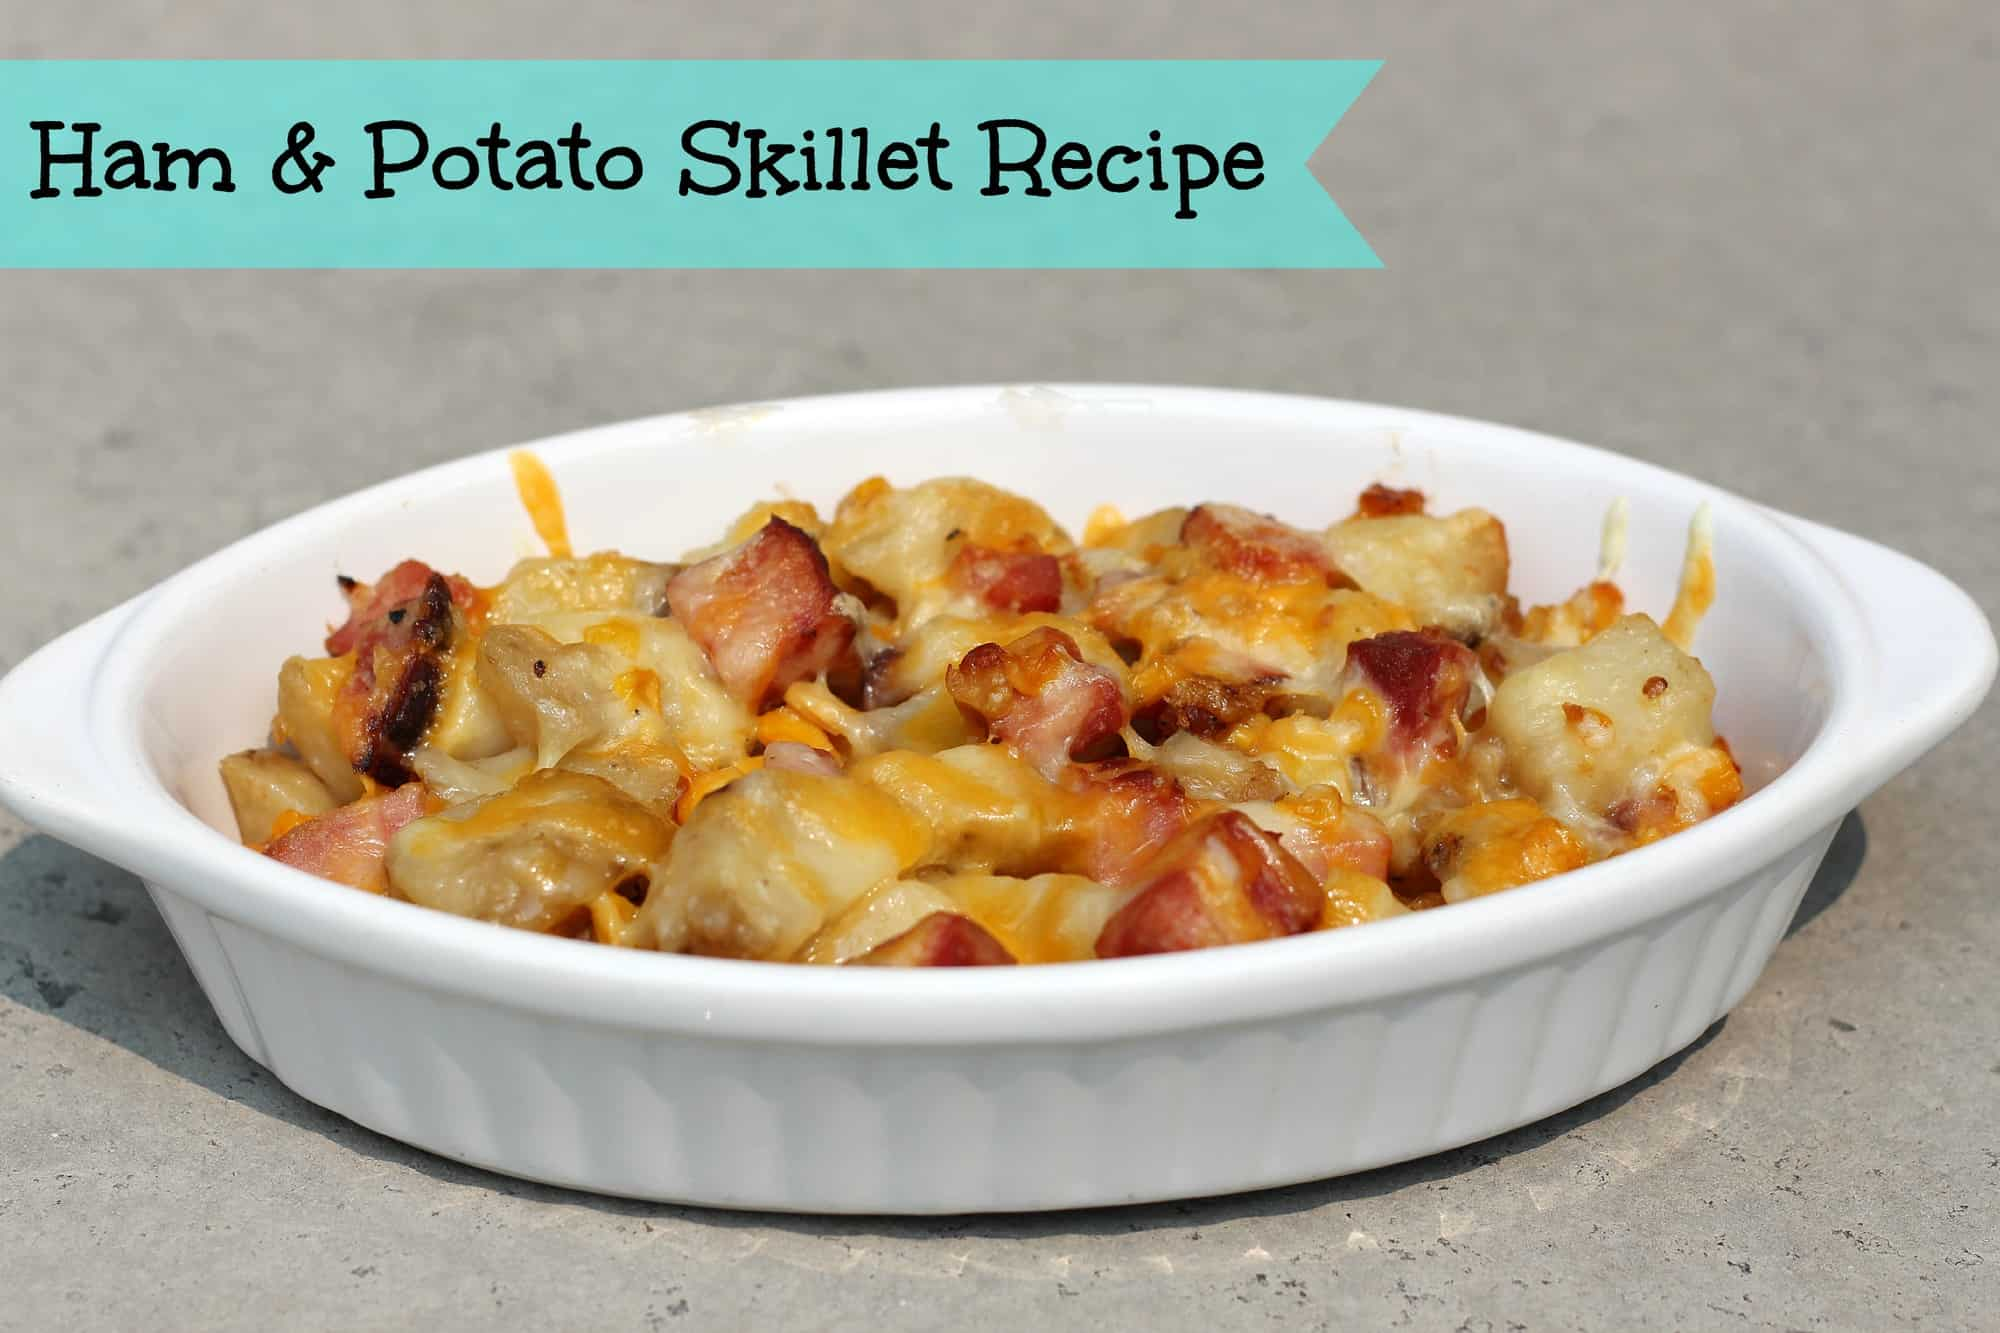 Quick and Easy Meals: Ham & Potato Skillet Recipe